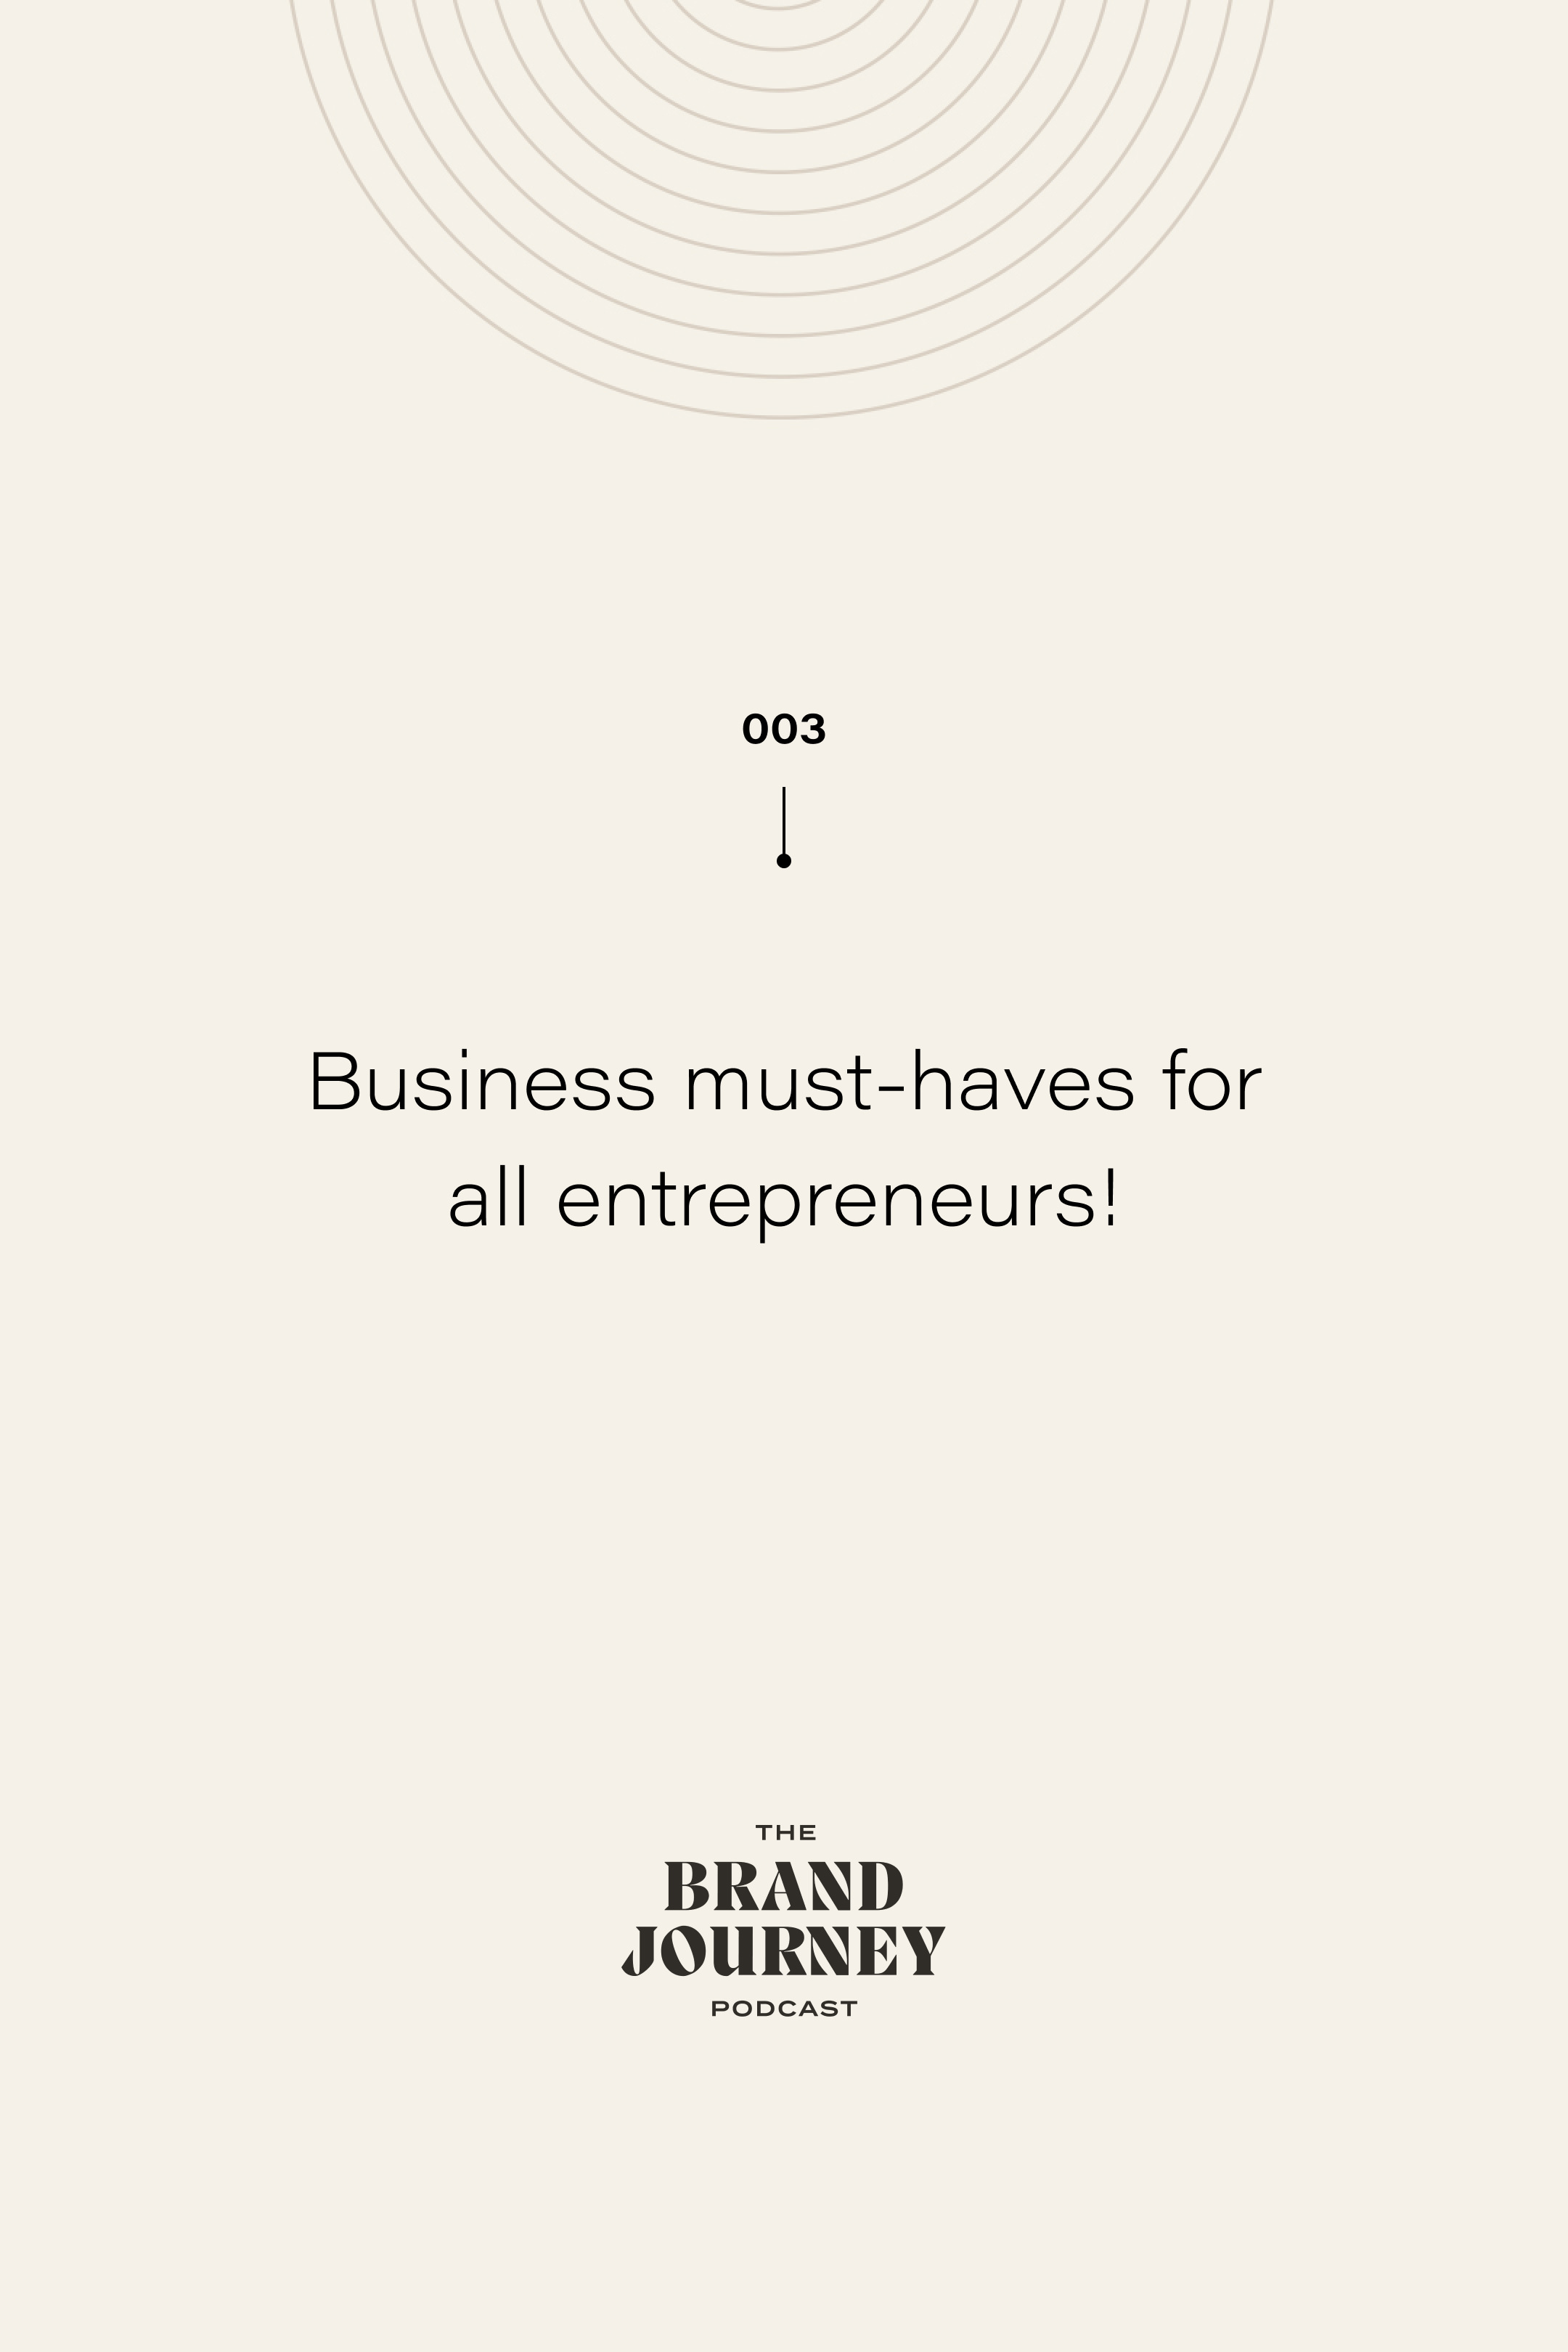 Business must-haves for all entrepreneurs